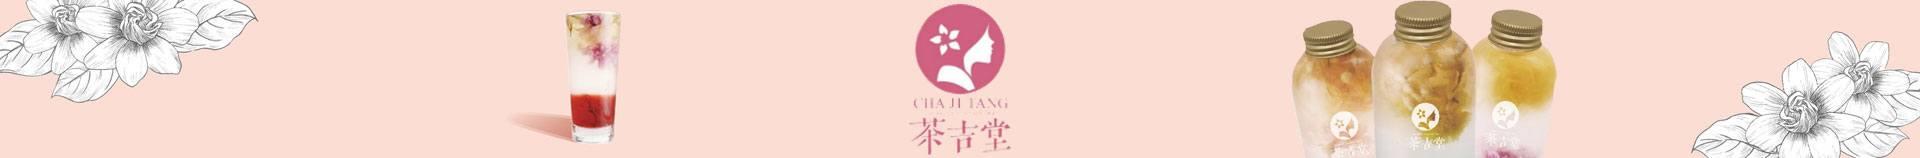 cha-yi-tang-banner-vnfranchise